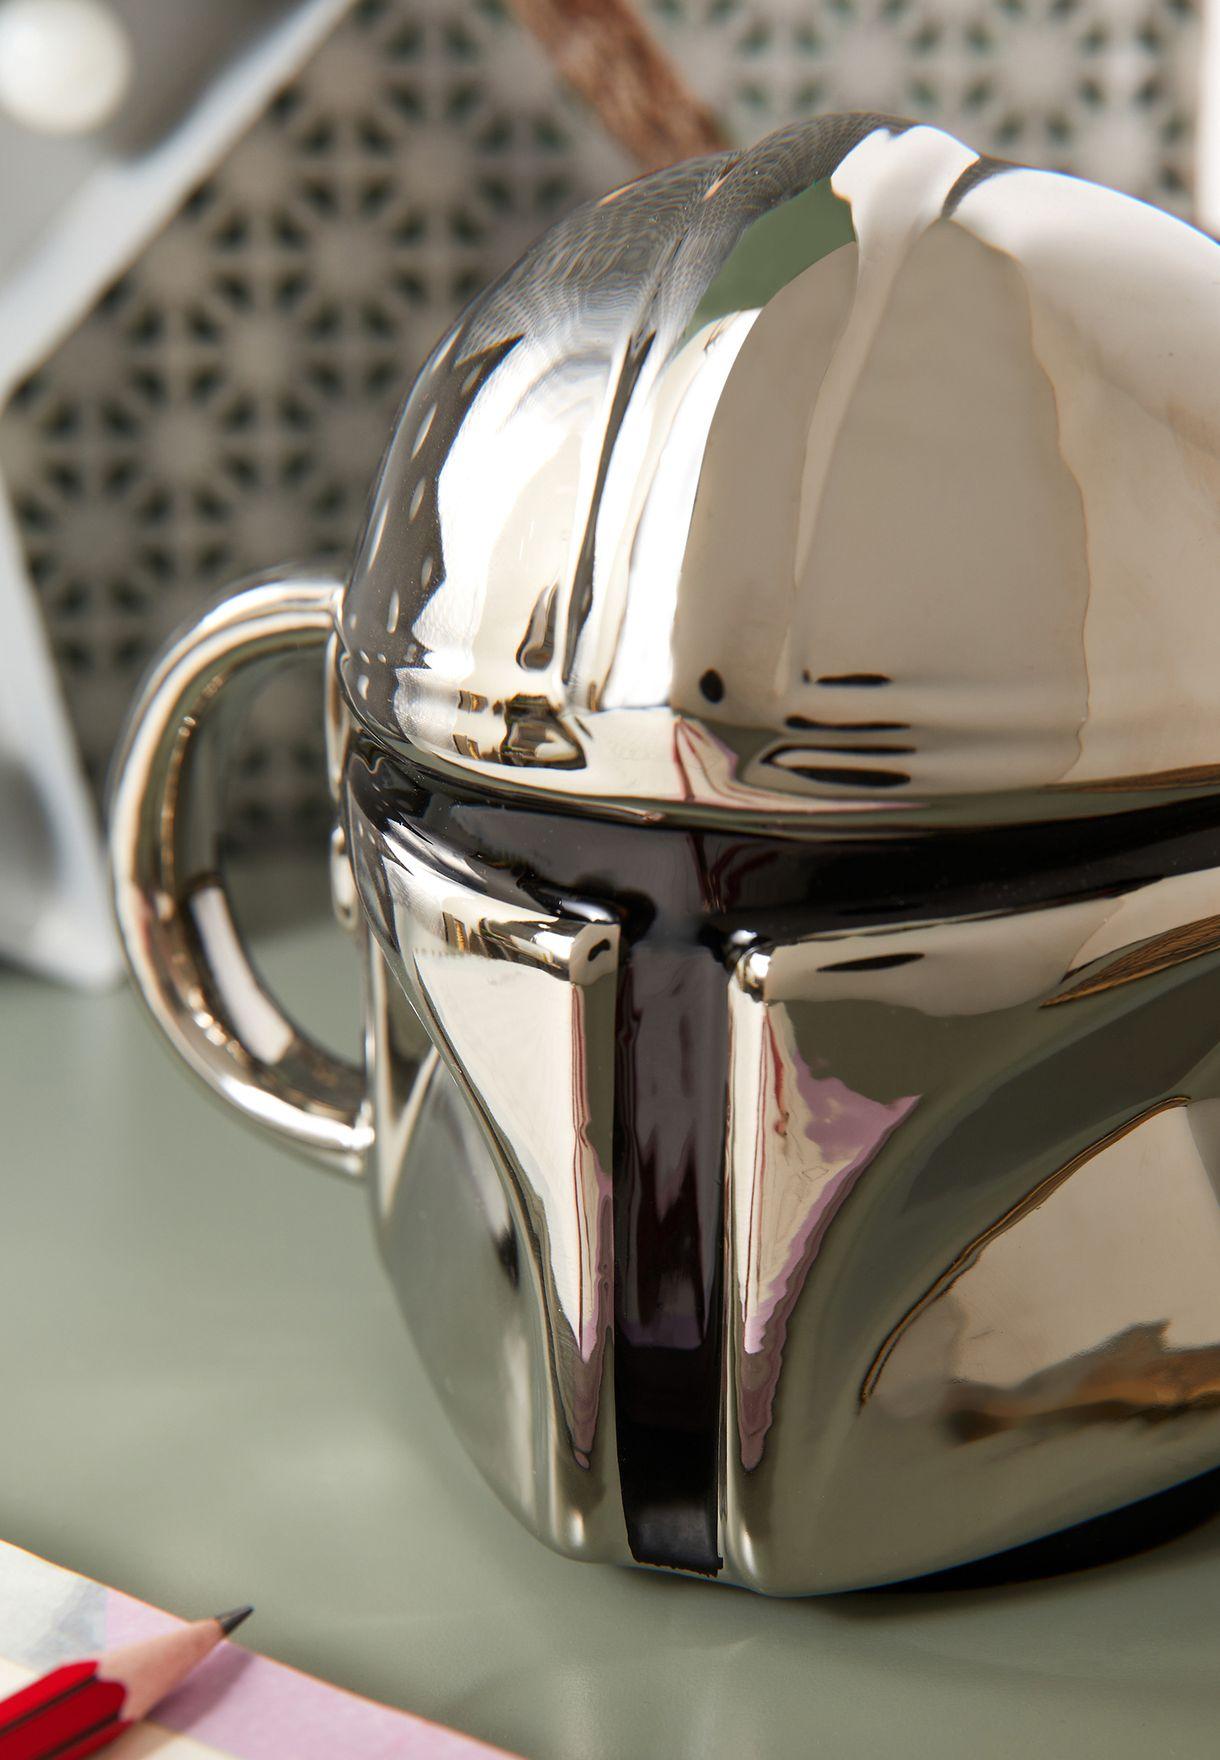 Star Wars Mandalorian Shaped Mug